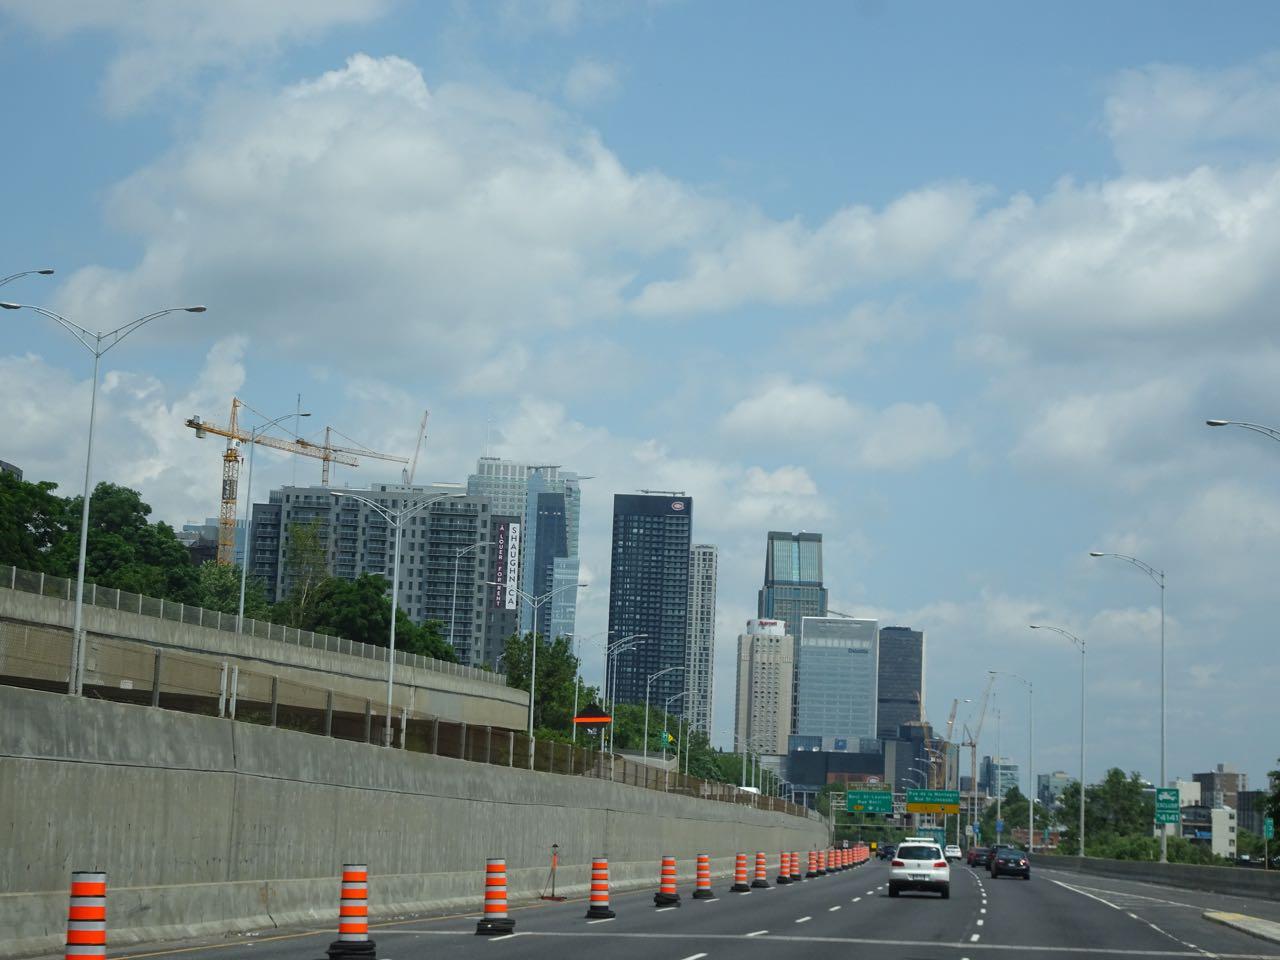 Erster Blick auf Montreal